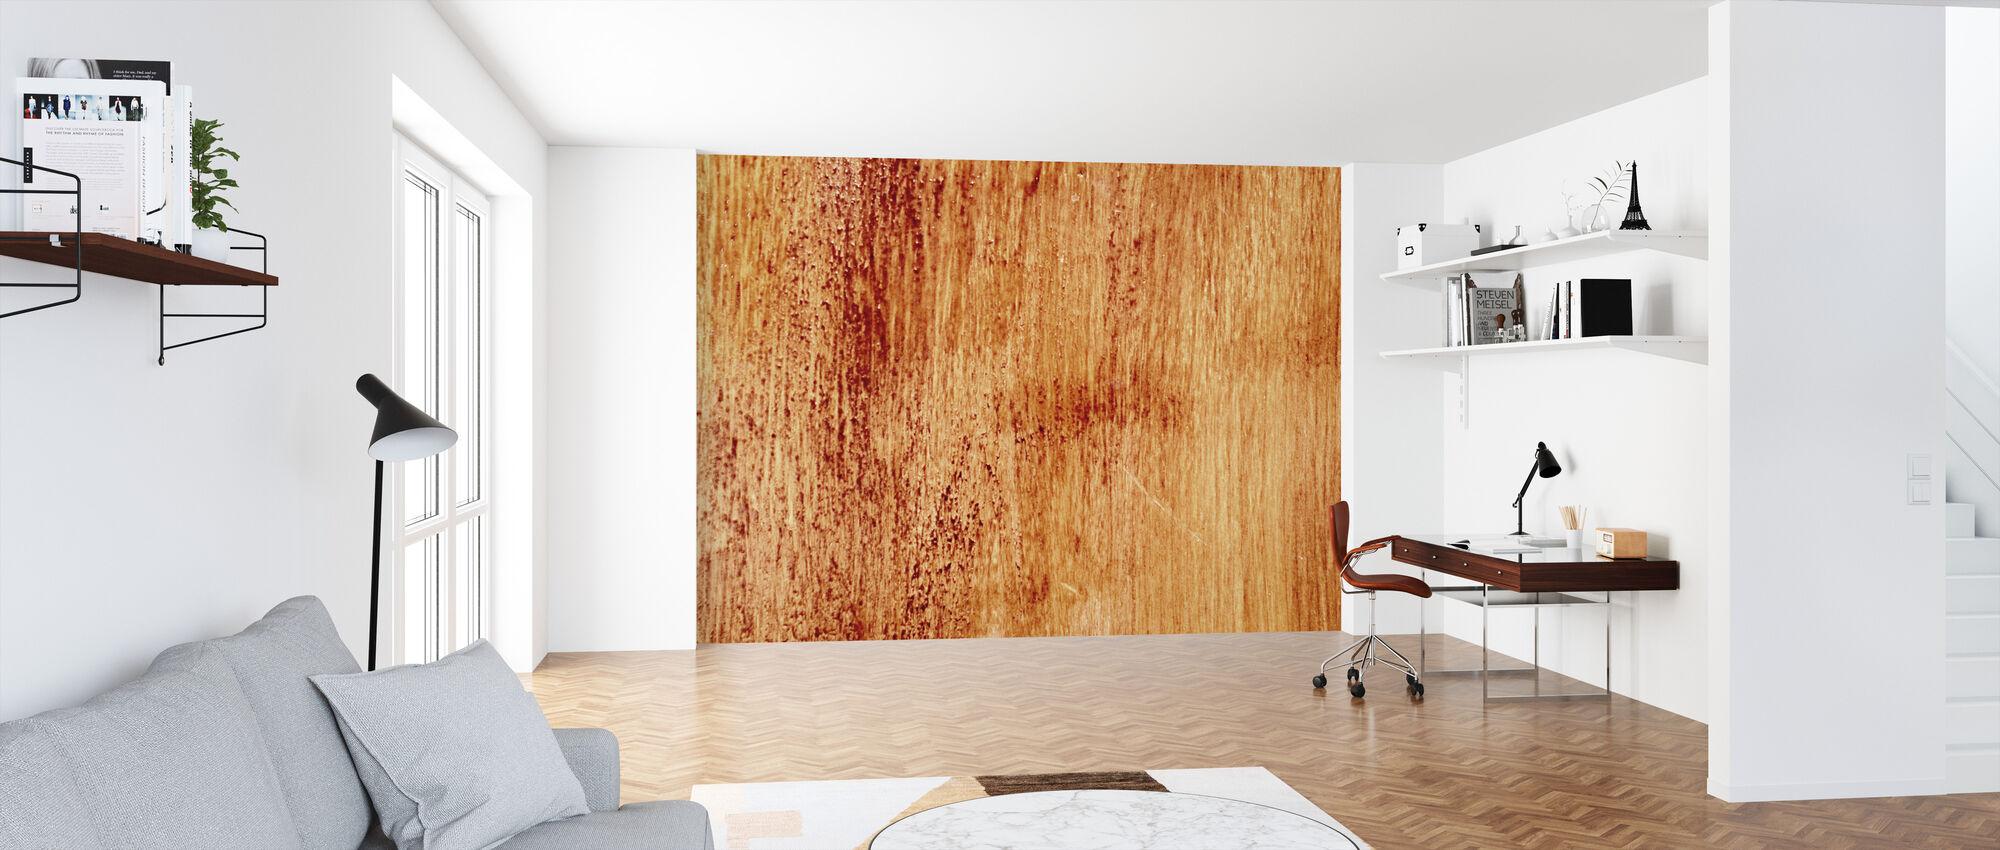 Bleeding Wood Wall - Wallpaper - Office